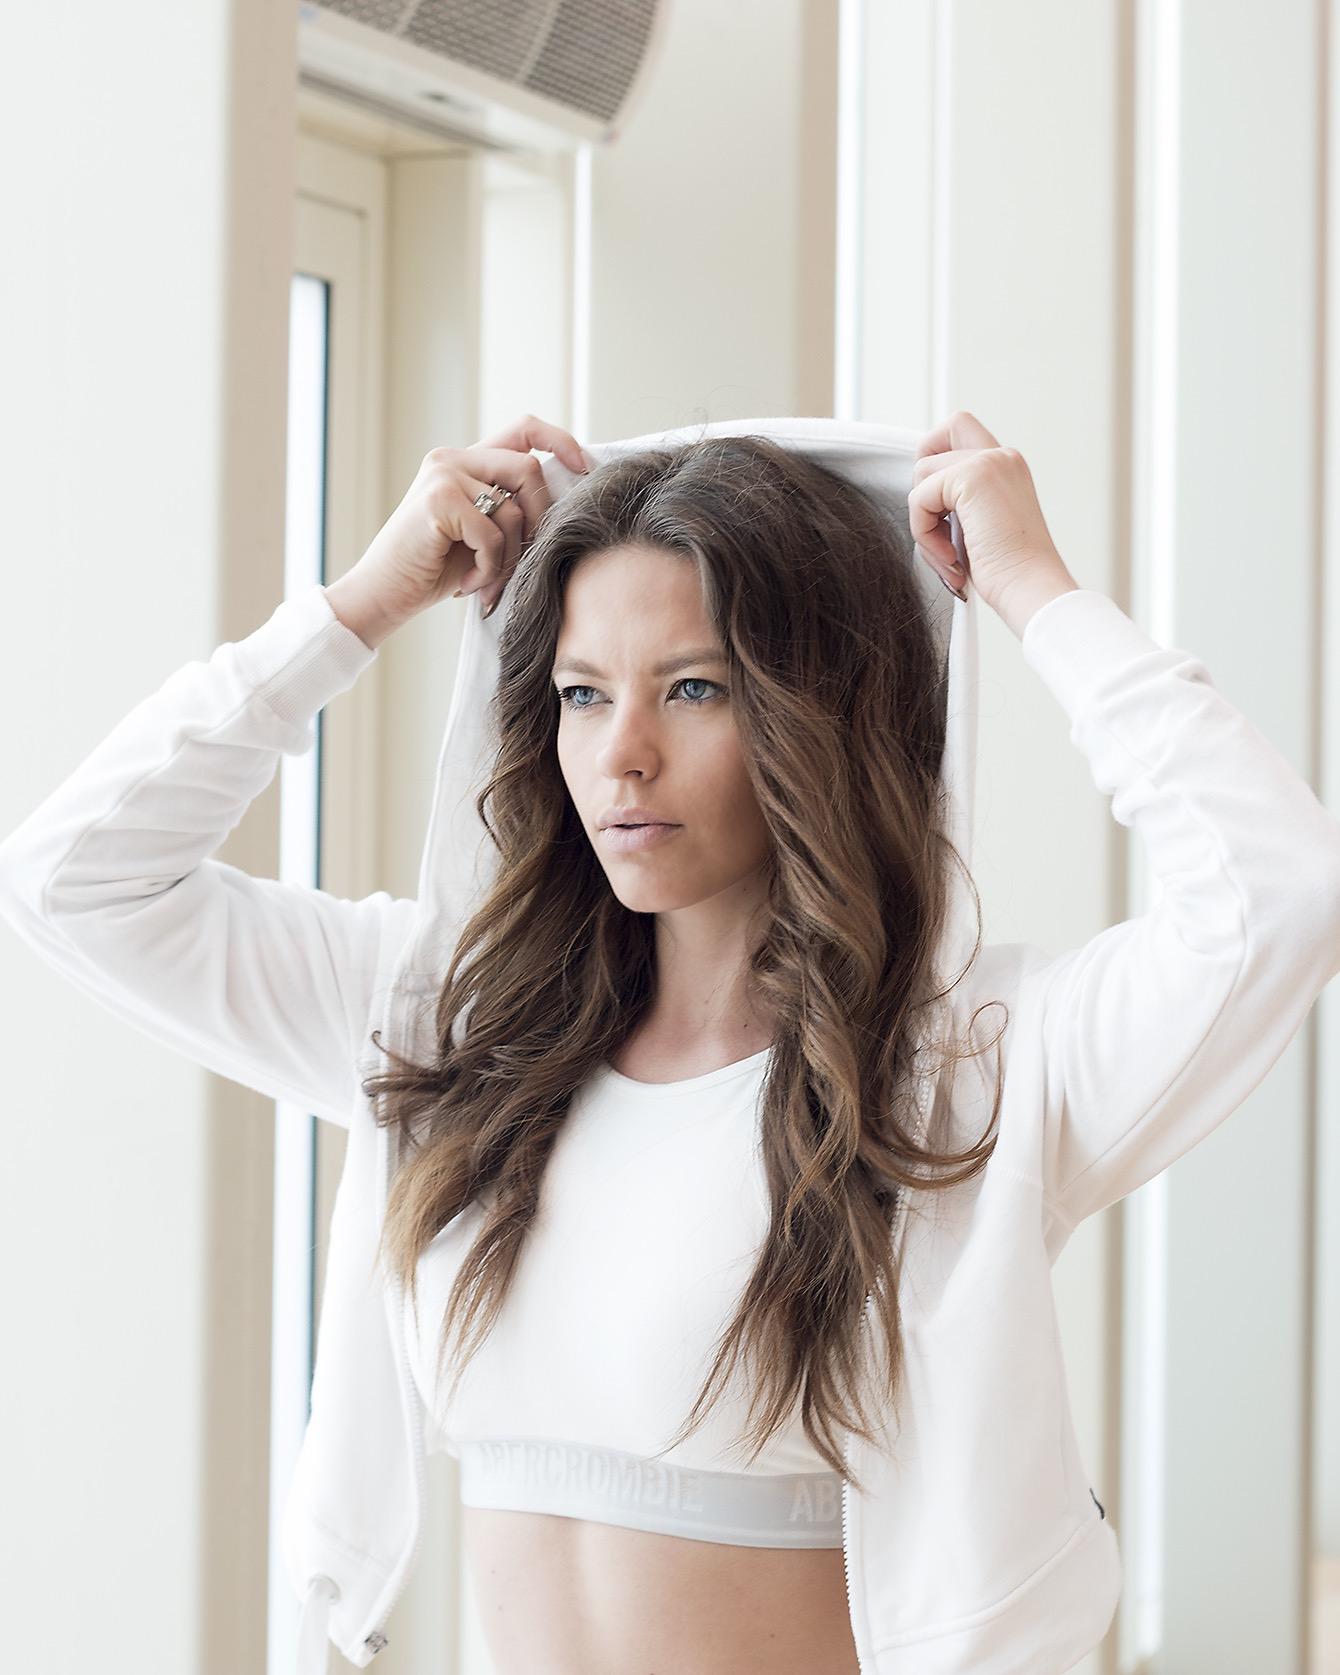 Holistic Nutritionist Fitness Expert Helena Oun - Destination Deluxe